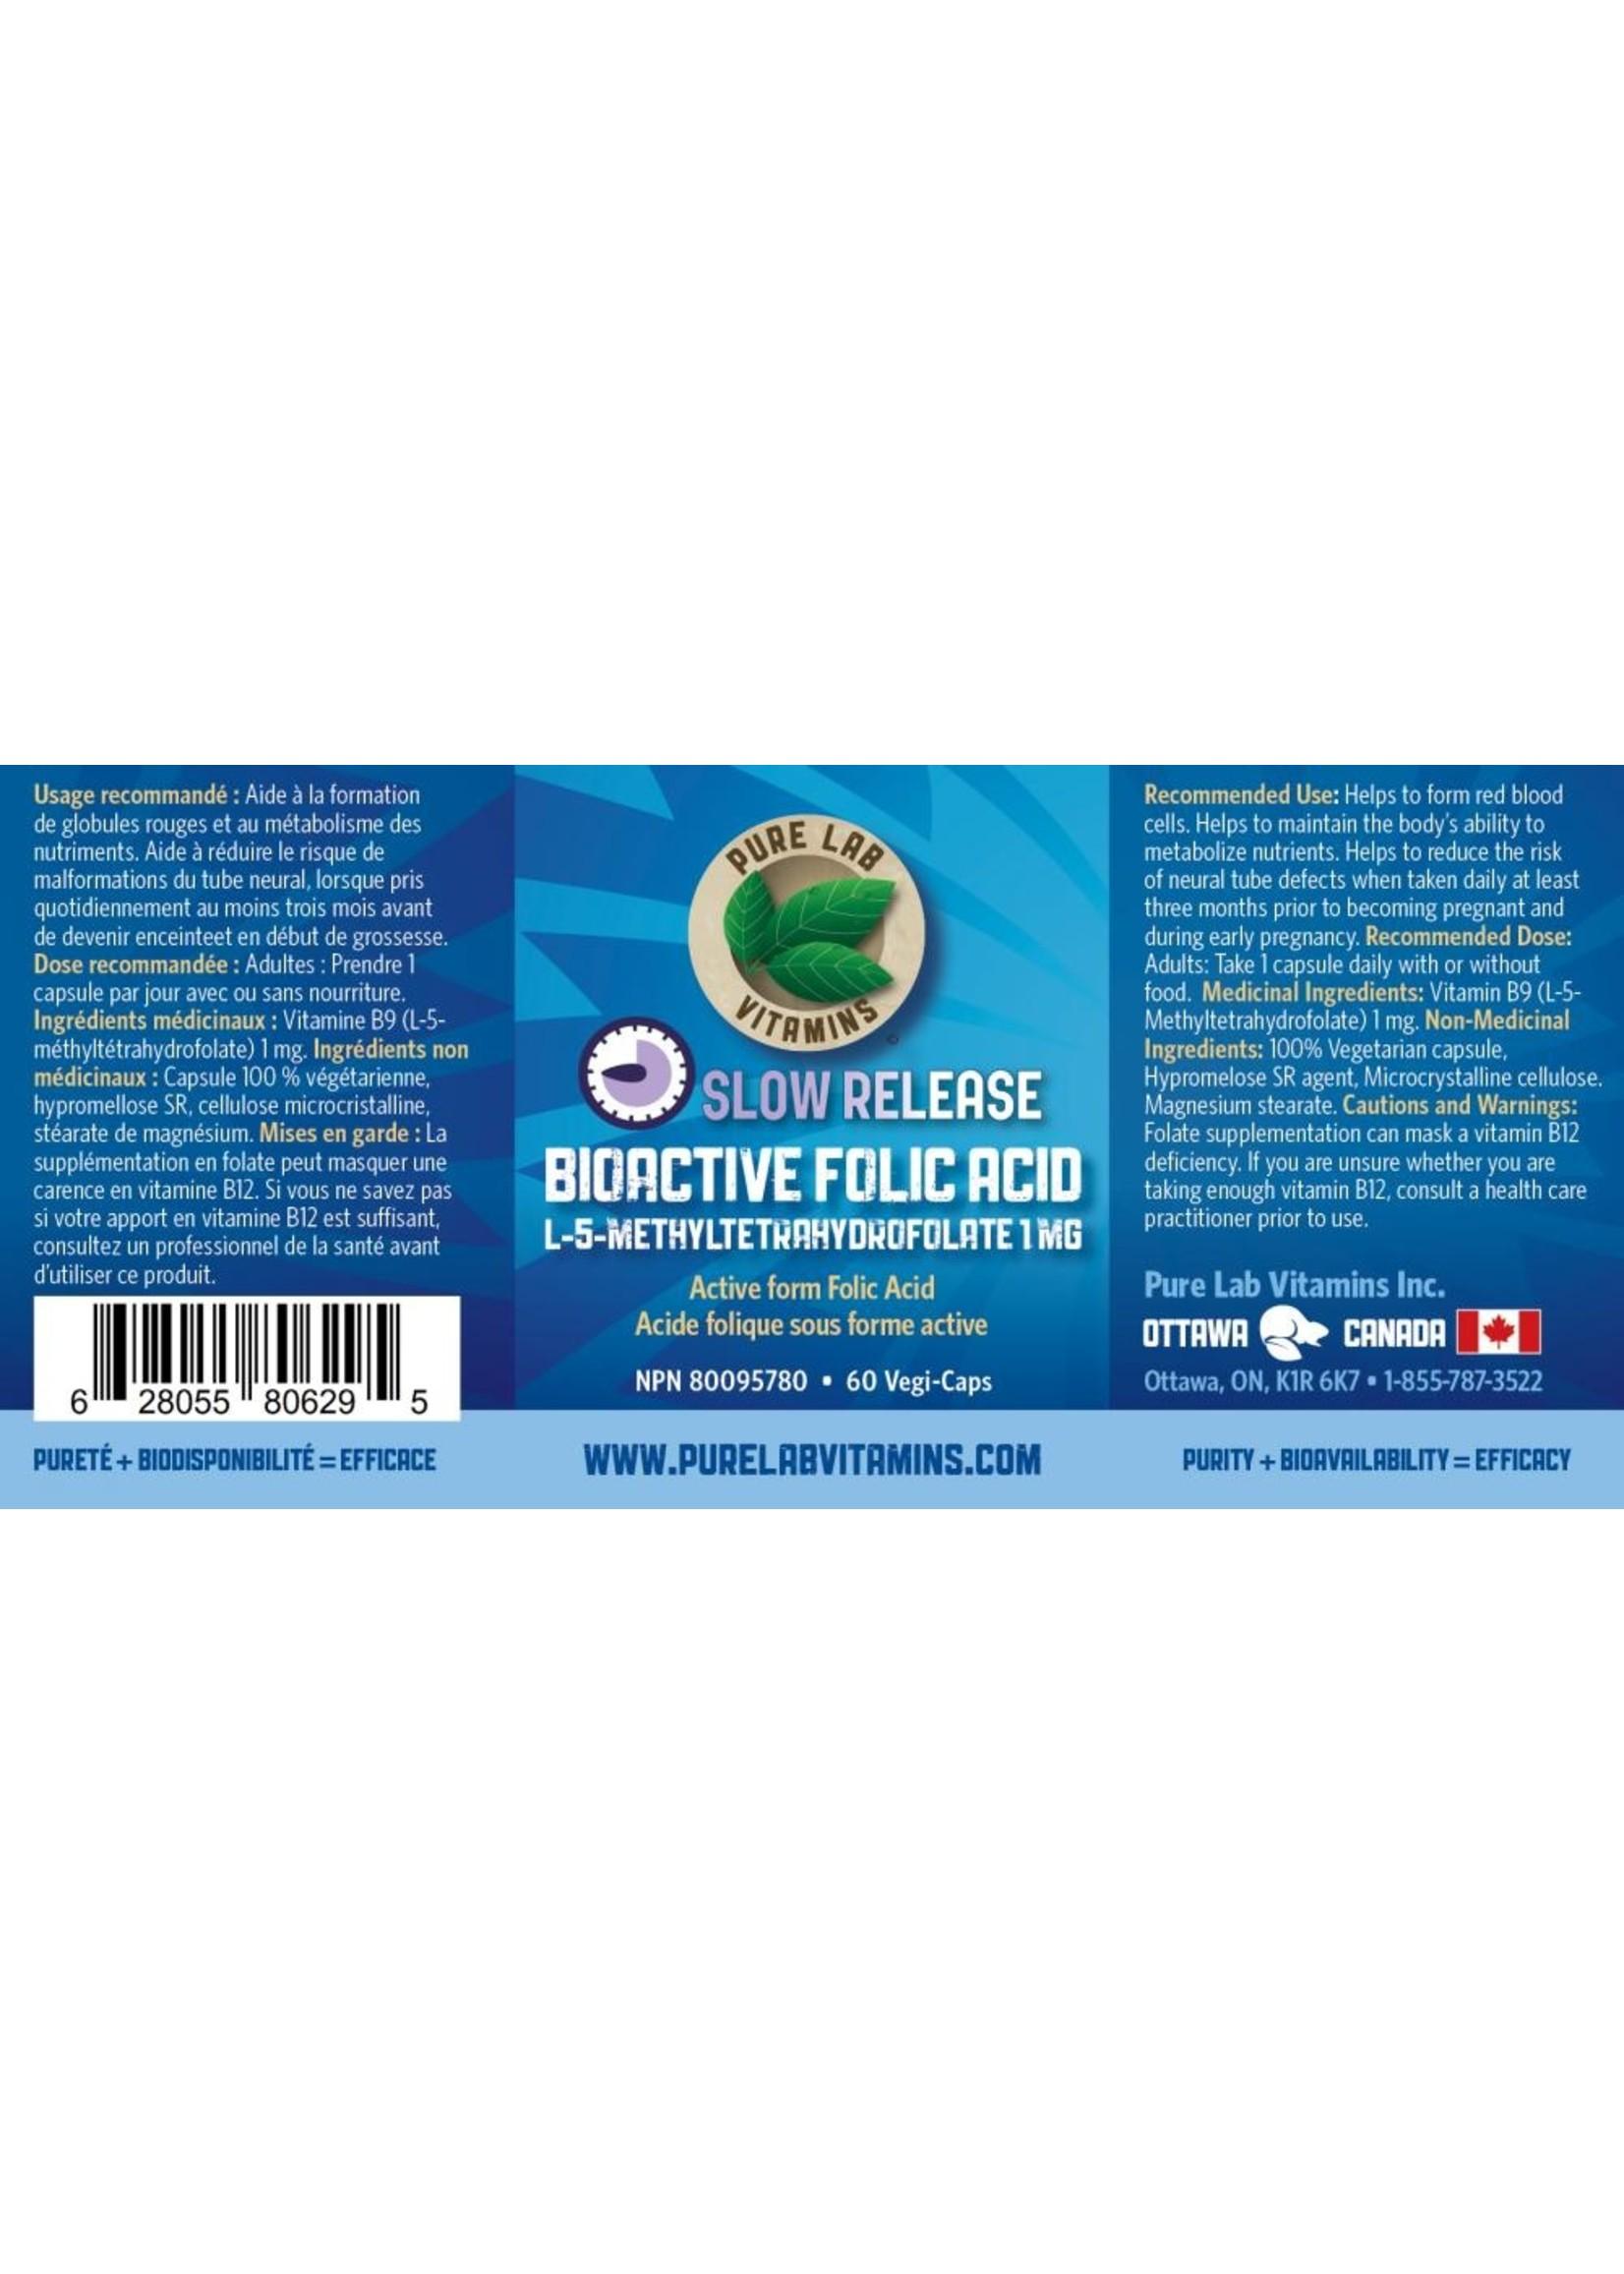 Pure lab Pure Lab Bioactive Folic Acid 1mg Slow Release